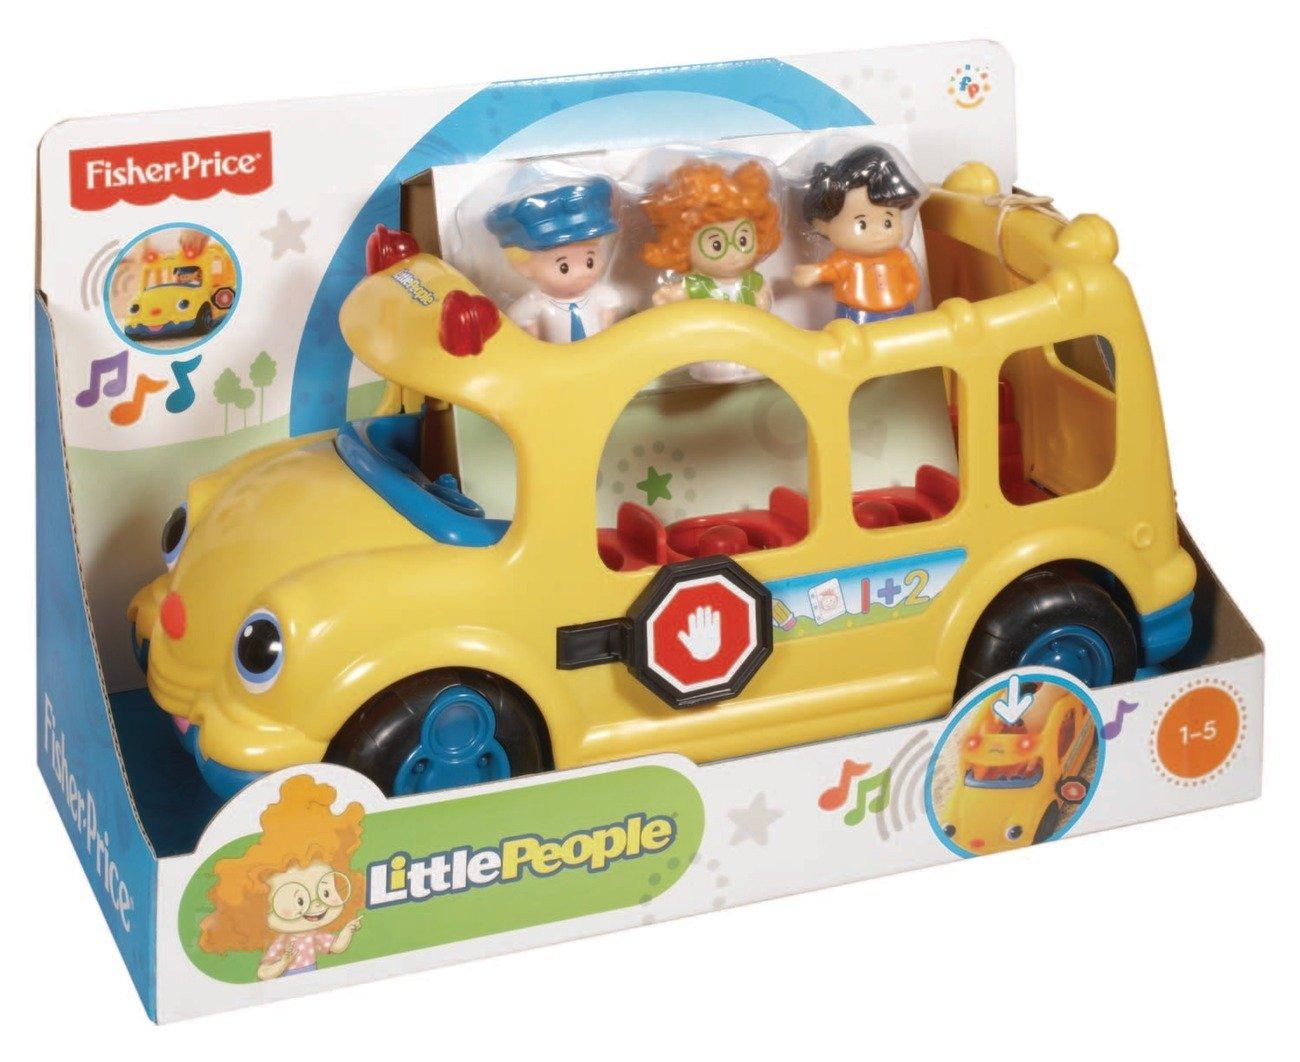 Fisher-Price Mattel J0894 Little people School Bus: Amazon.co.uk ...